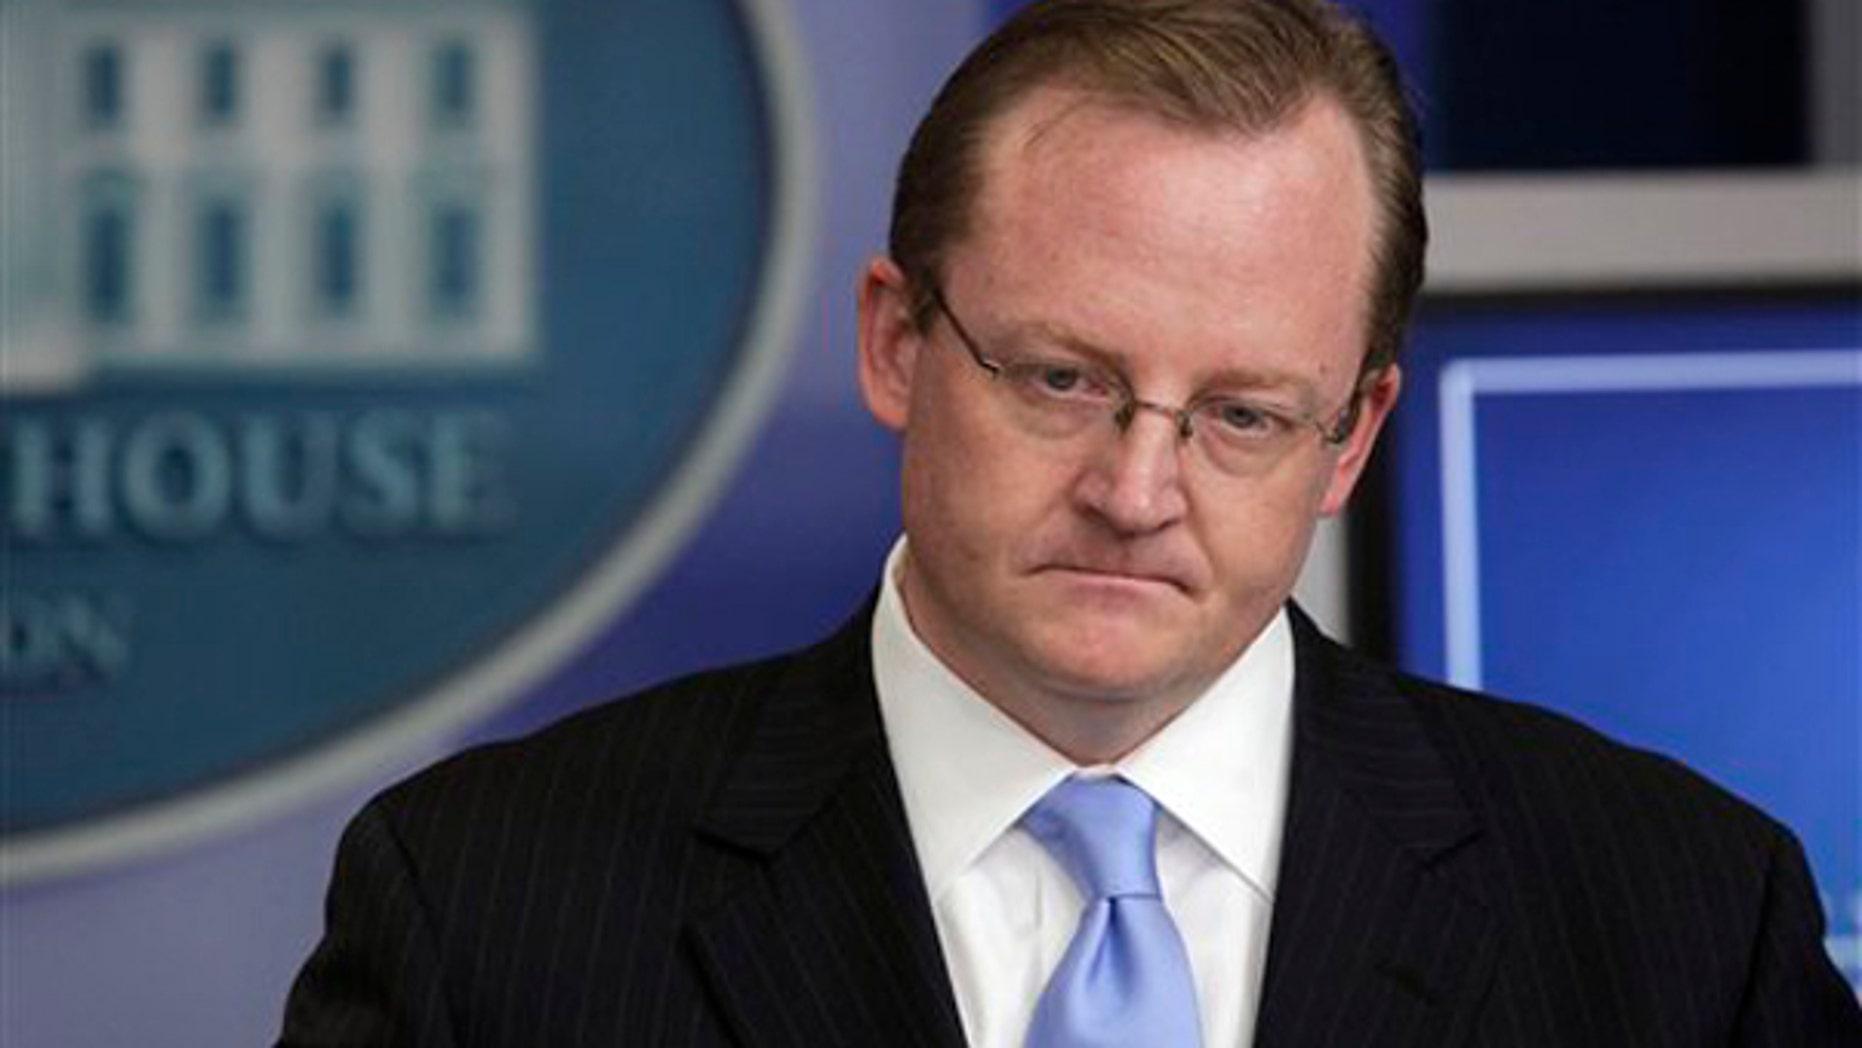 White House Press Secretary Robert Gibbs is shown here at the White House Nov. 2. (AP Photo)